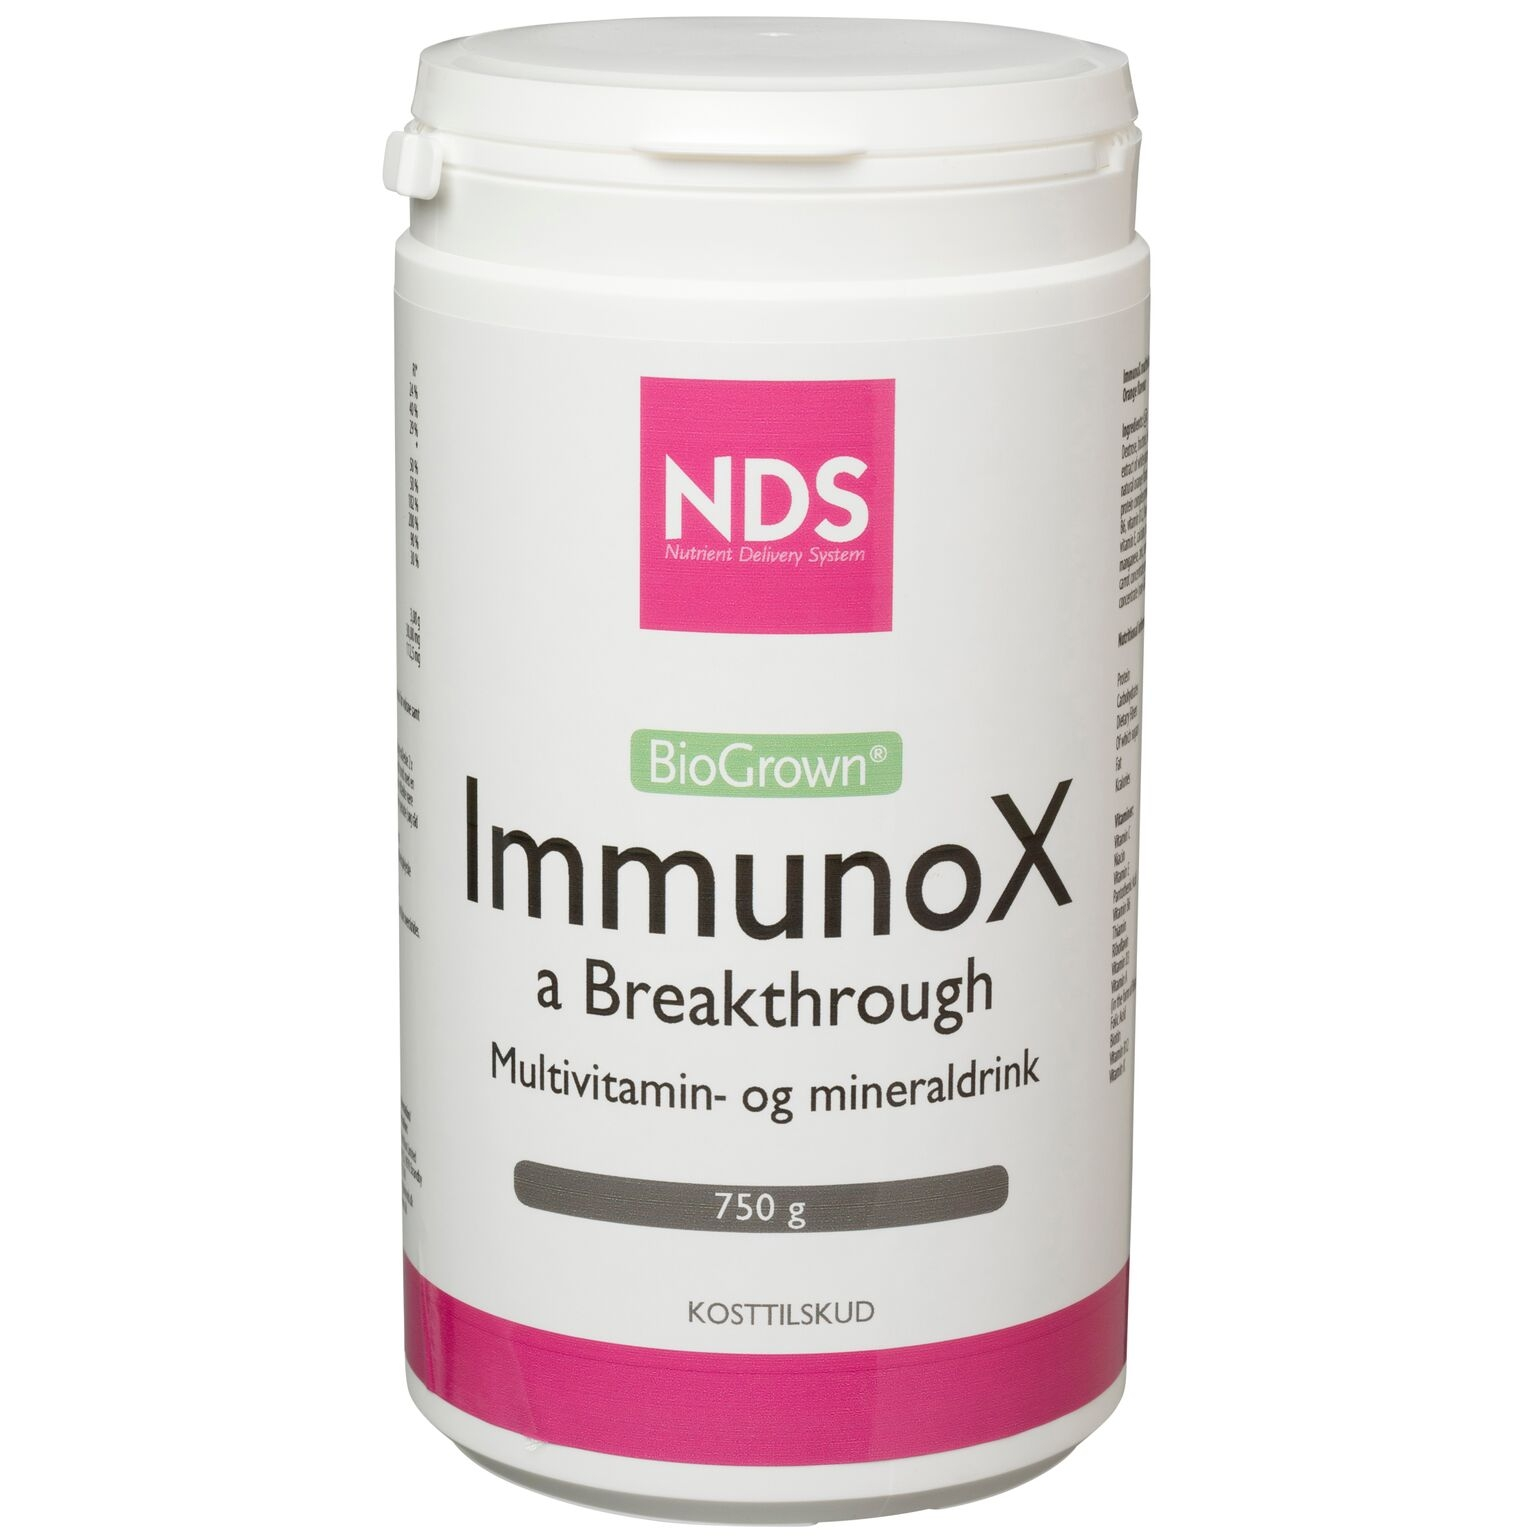 Image of NDS Breakthrough Immuno-Plex 750 gr